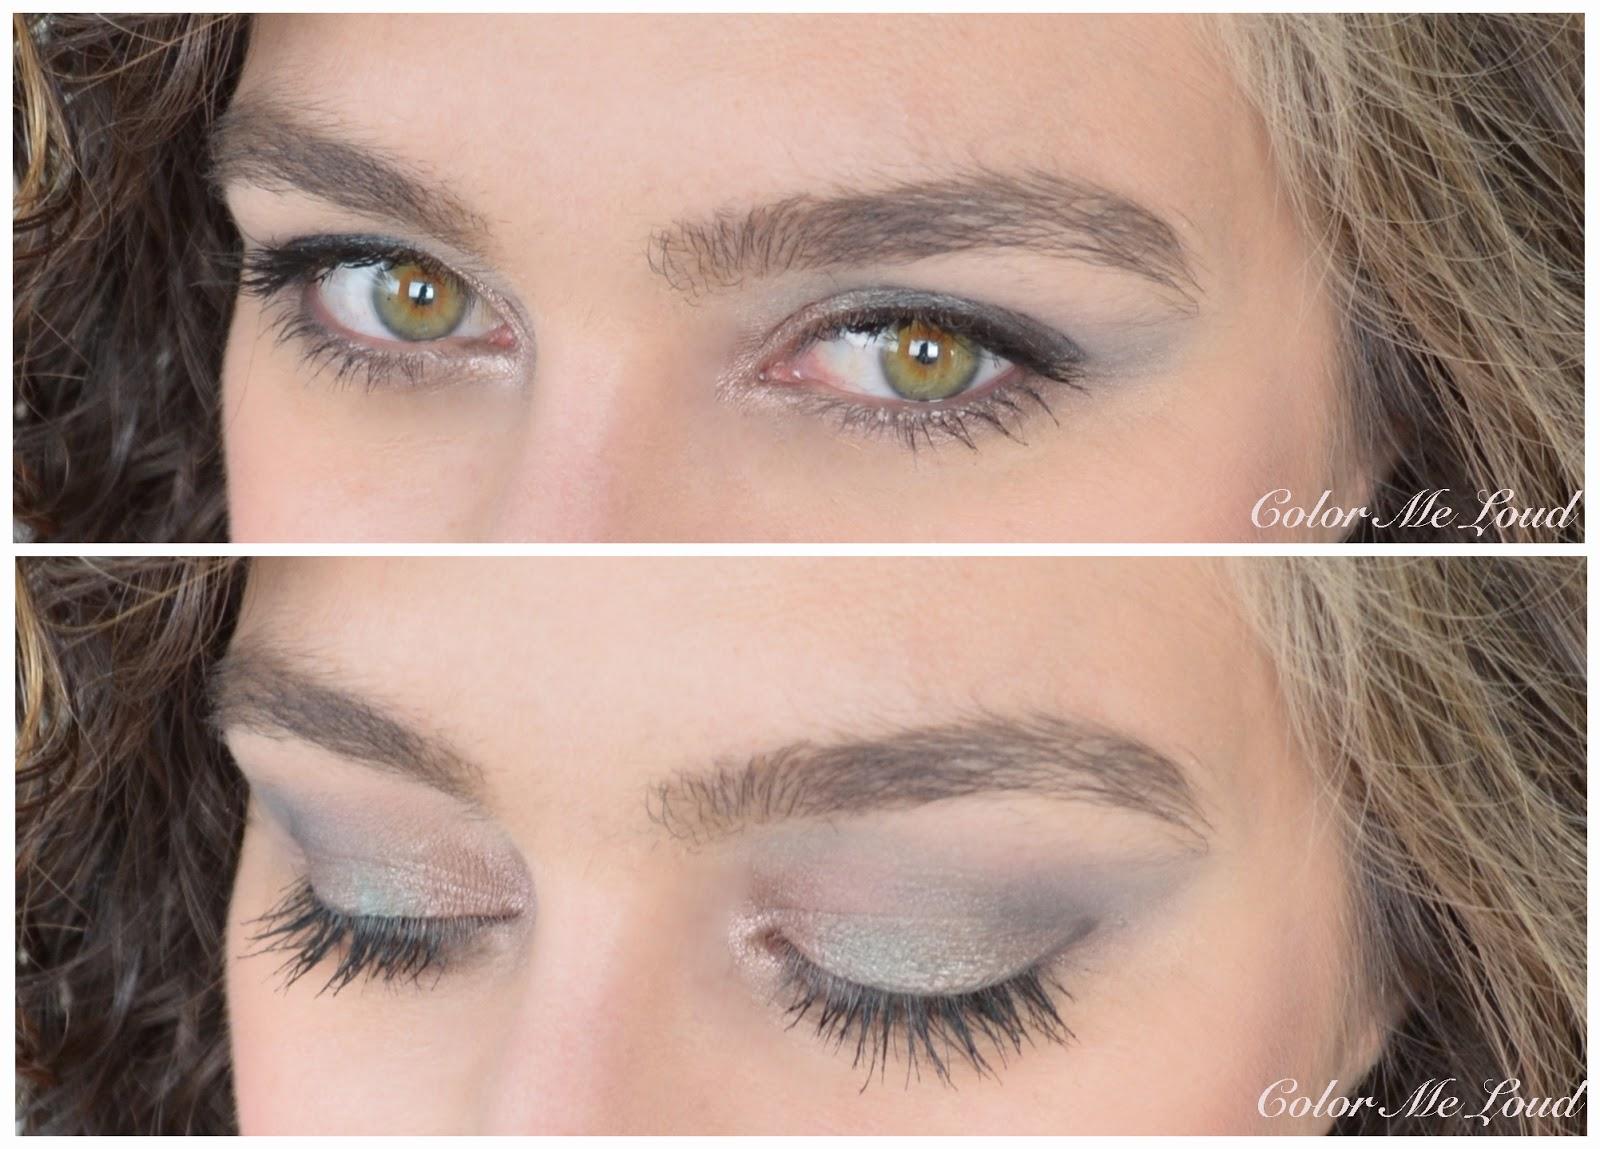 On the eyes: Lancôme My Paris Eye Shadow Palette